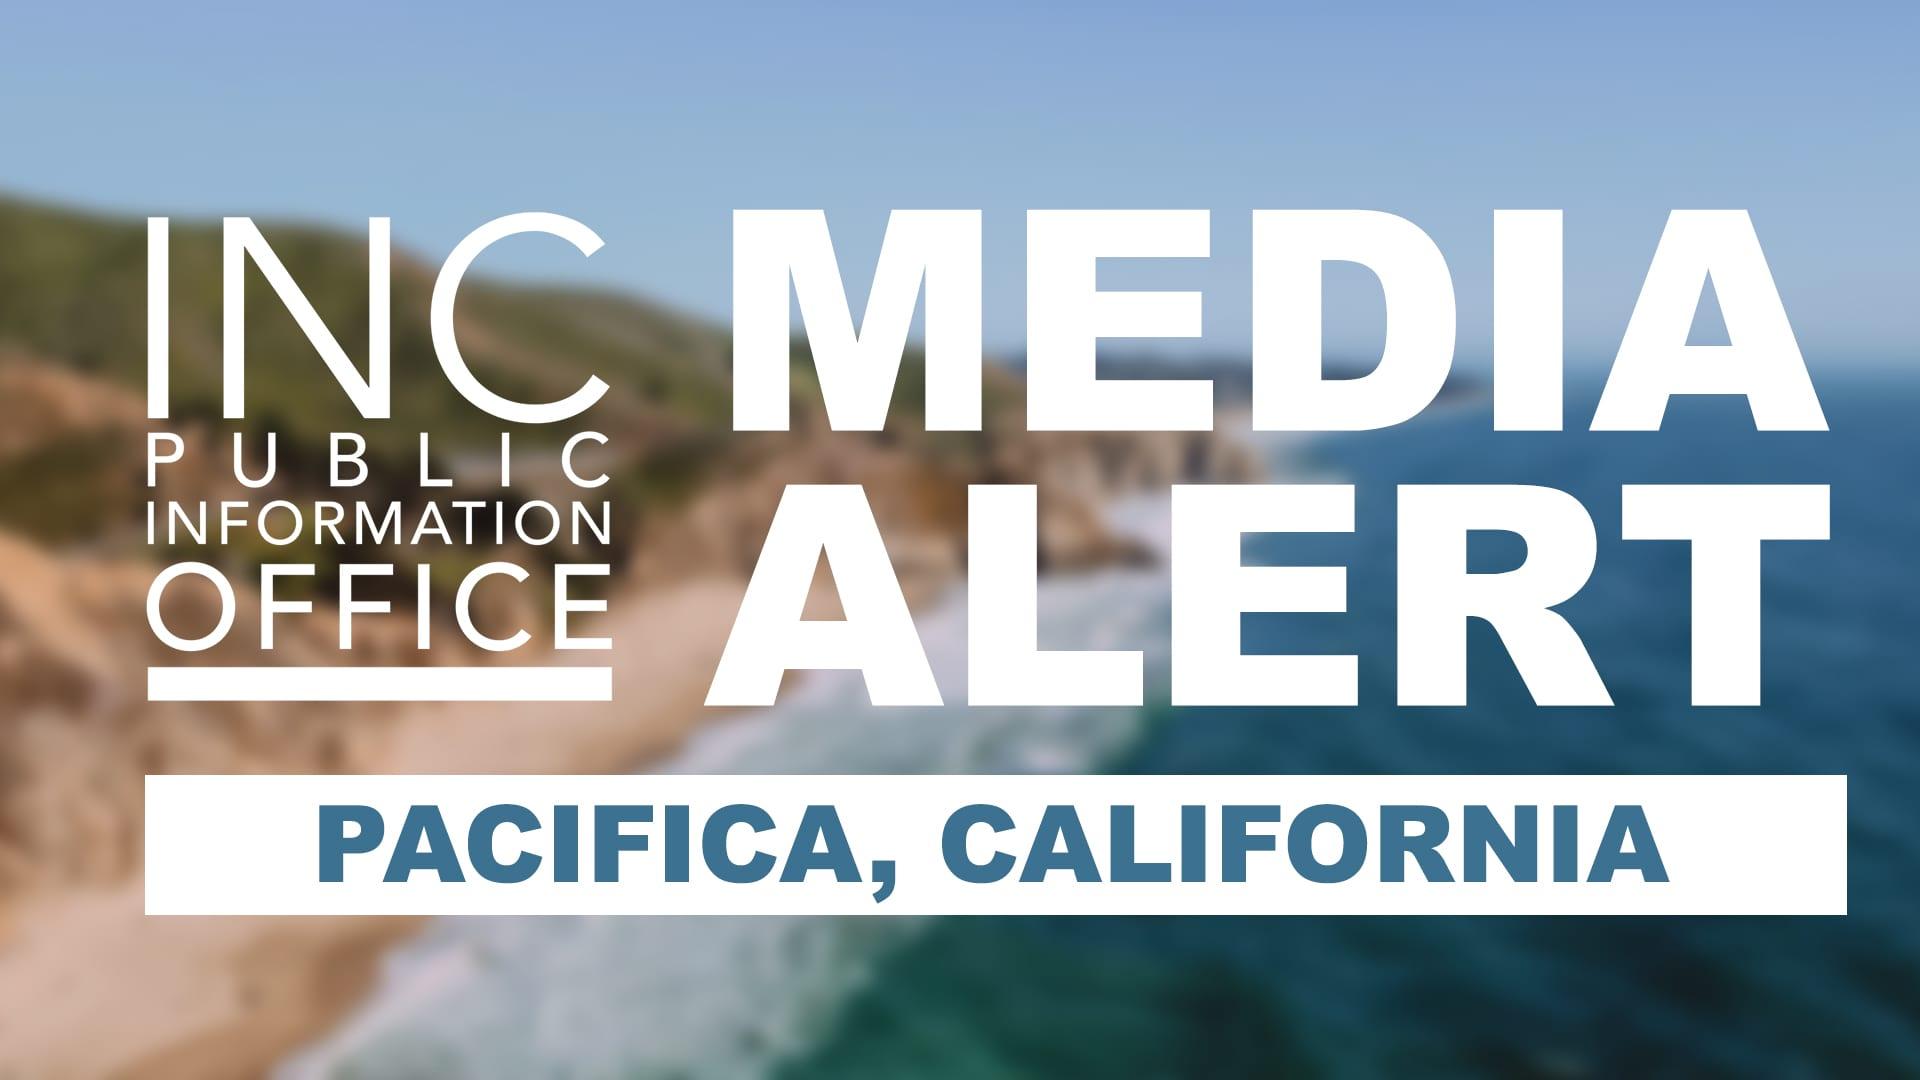 Blue ocean meets a cliff shoreline with text: INC Public Information Office Media Alert - Pacifica, California